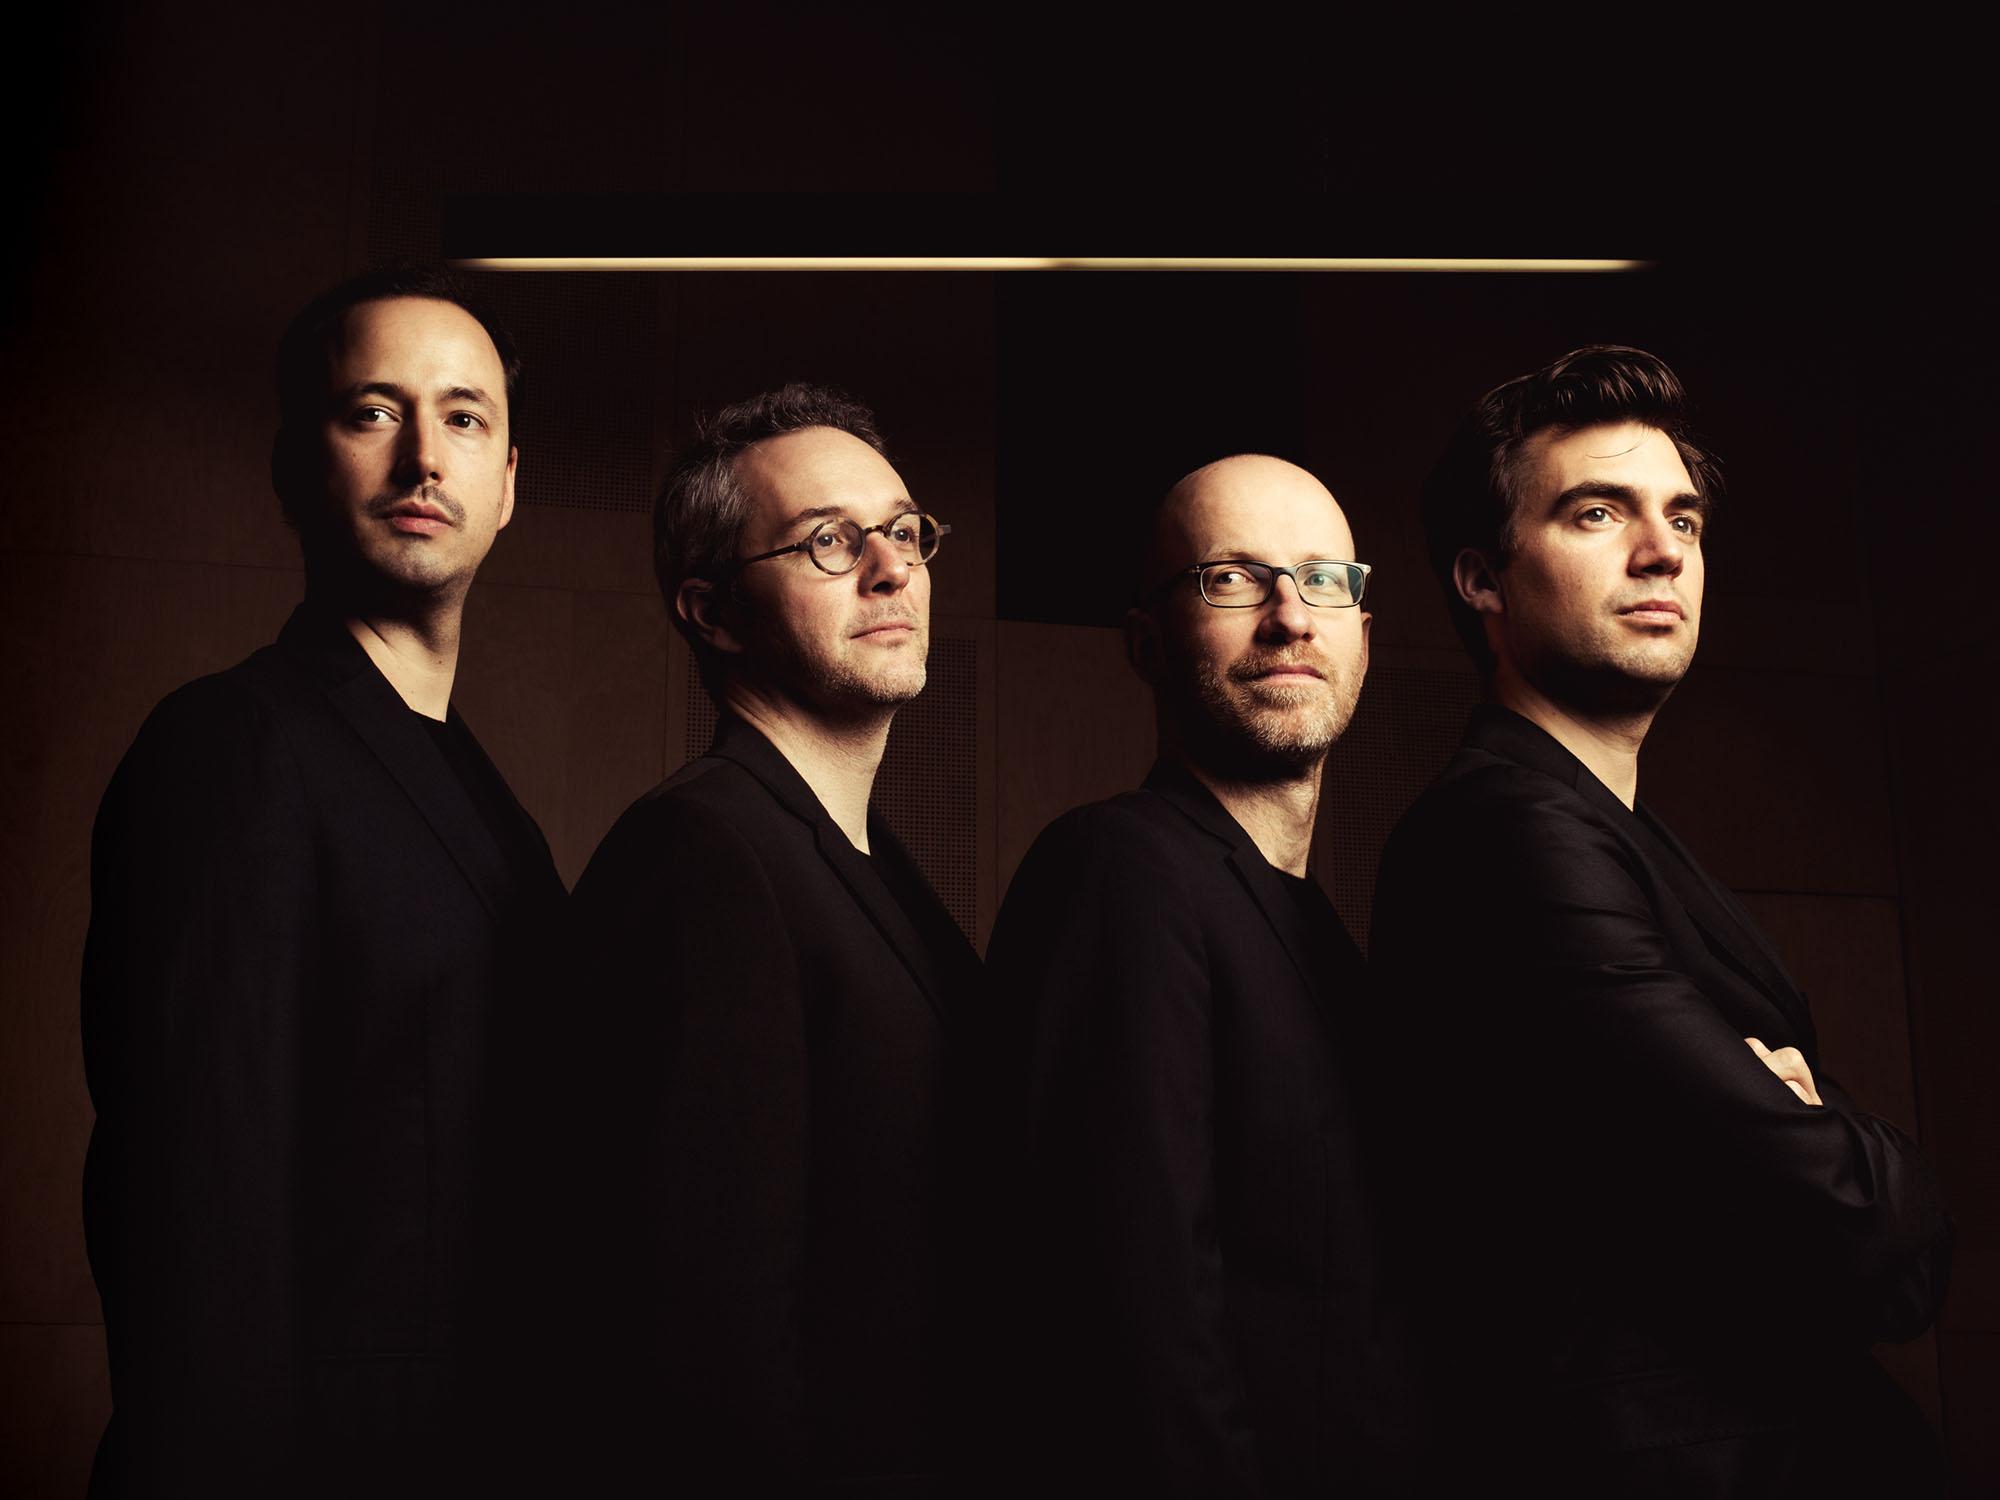 Quatuor Dutilleux - quatuor à cordes